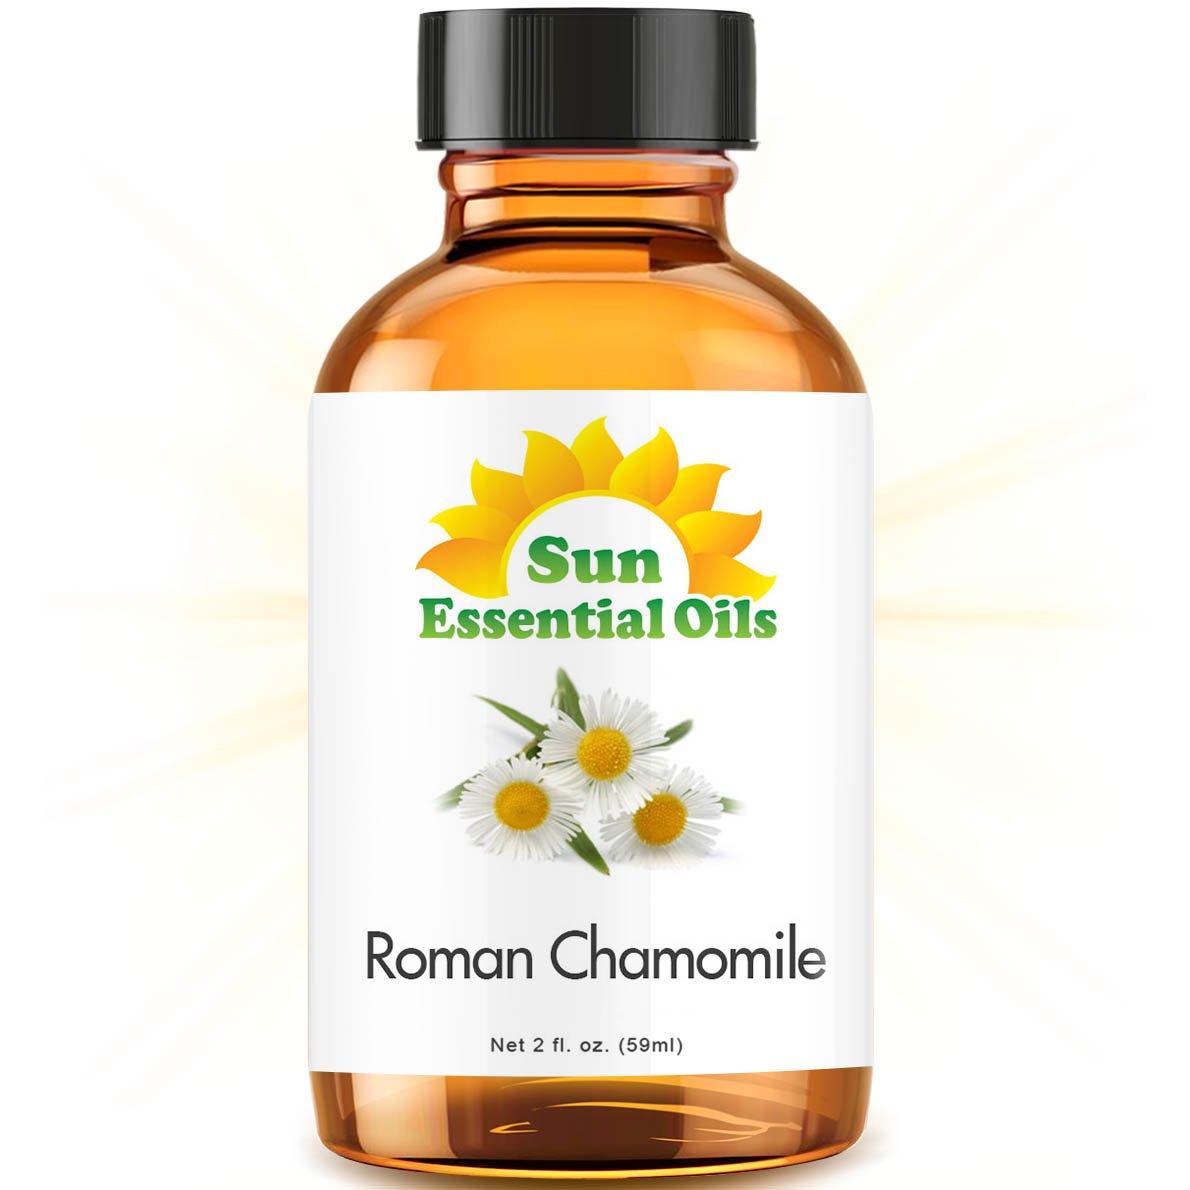 Chamomile (Roman) (2 fl oz) Best Essential Oil - 2 ounces (59ml)